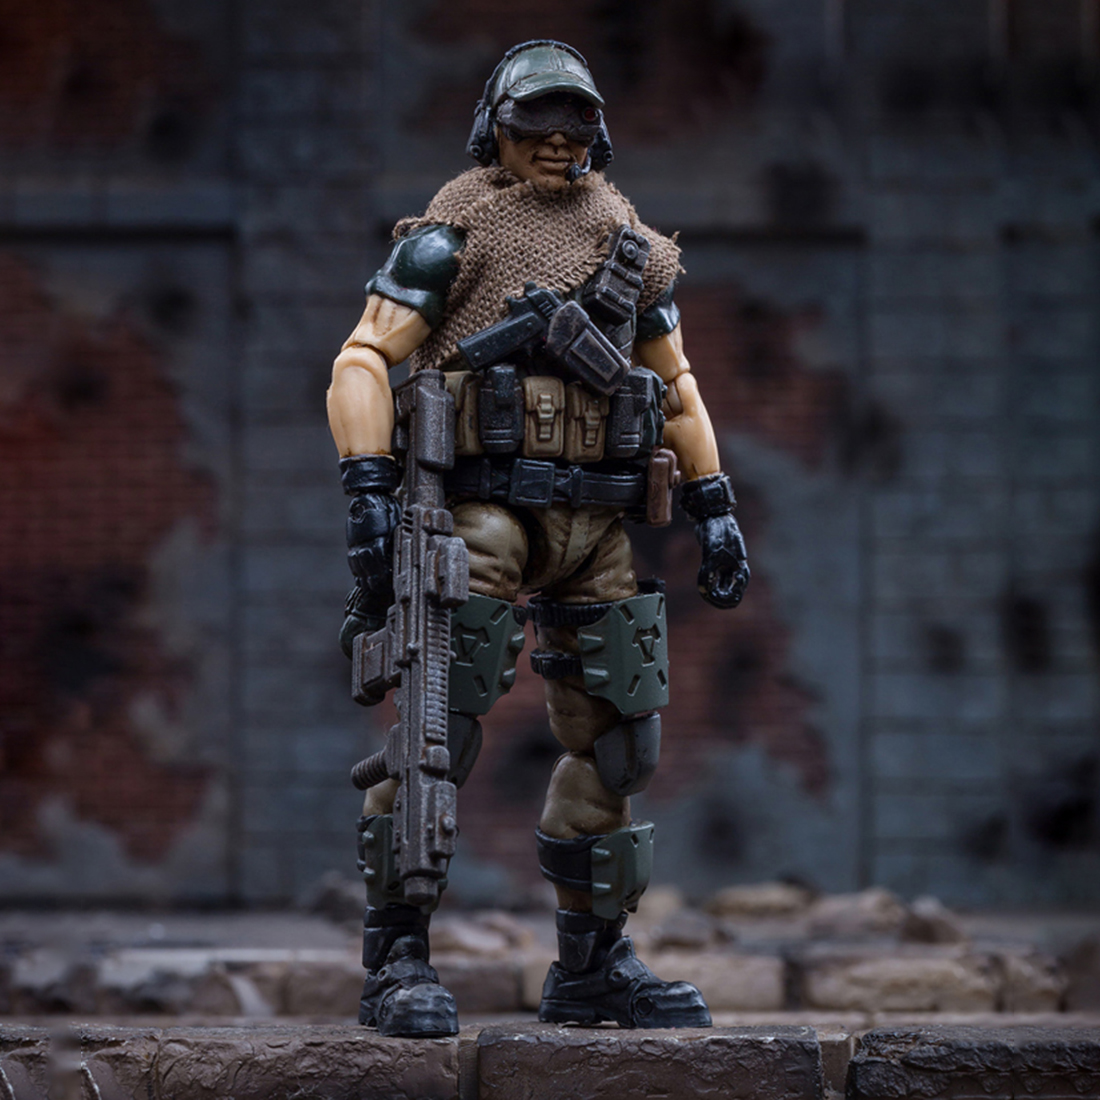 1//18 Soldier Model 3D Russian Federation Caucasus Team DIY Fine Toy for Men